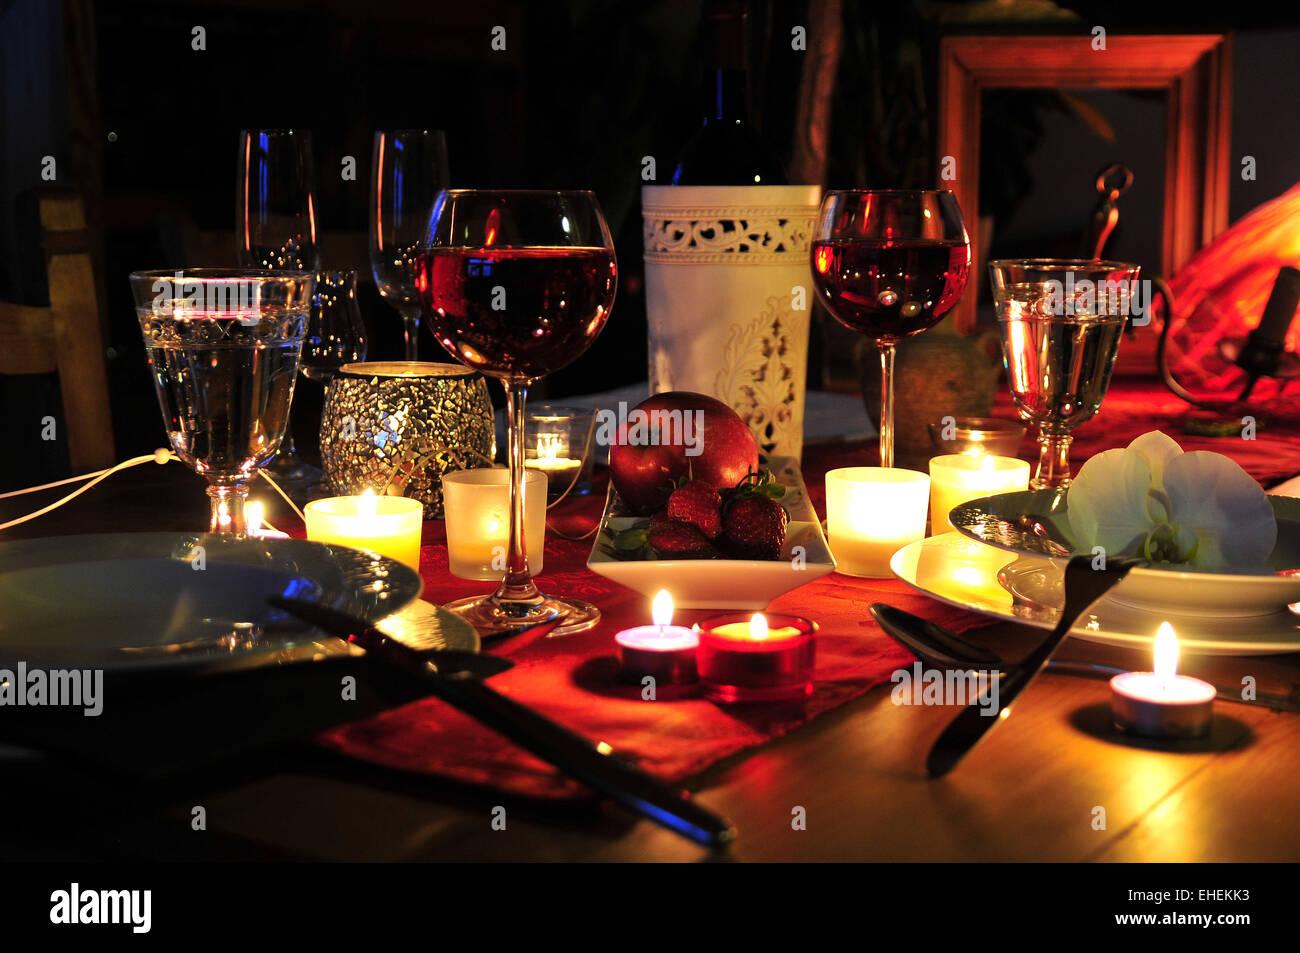 romantisches candle light dinner stockfoto bild 79613383. Black Bedroom Furniture Sets. Home Design Ideas